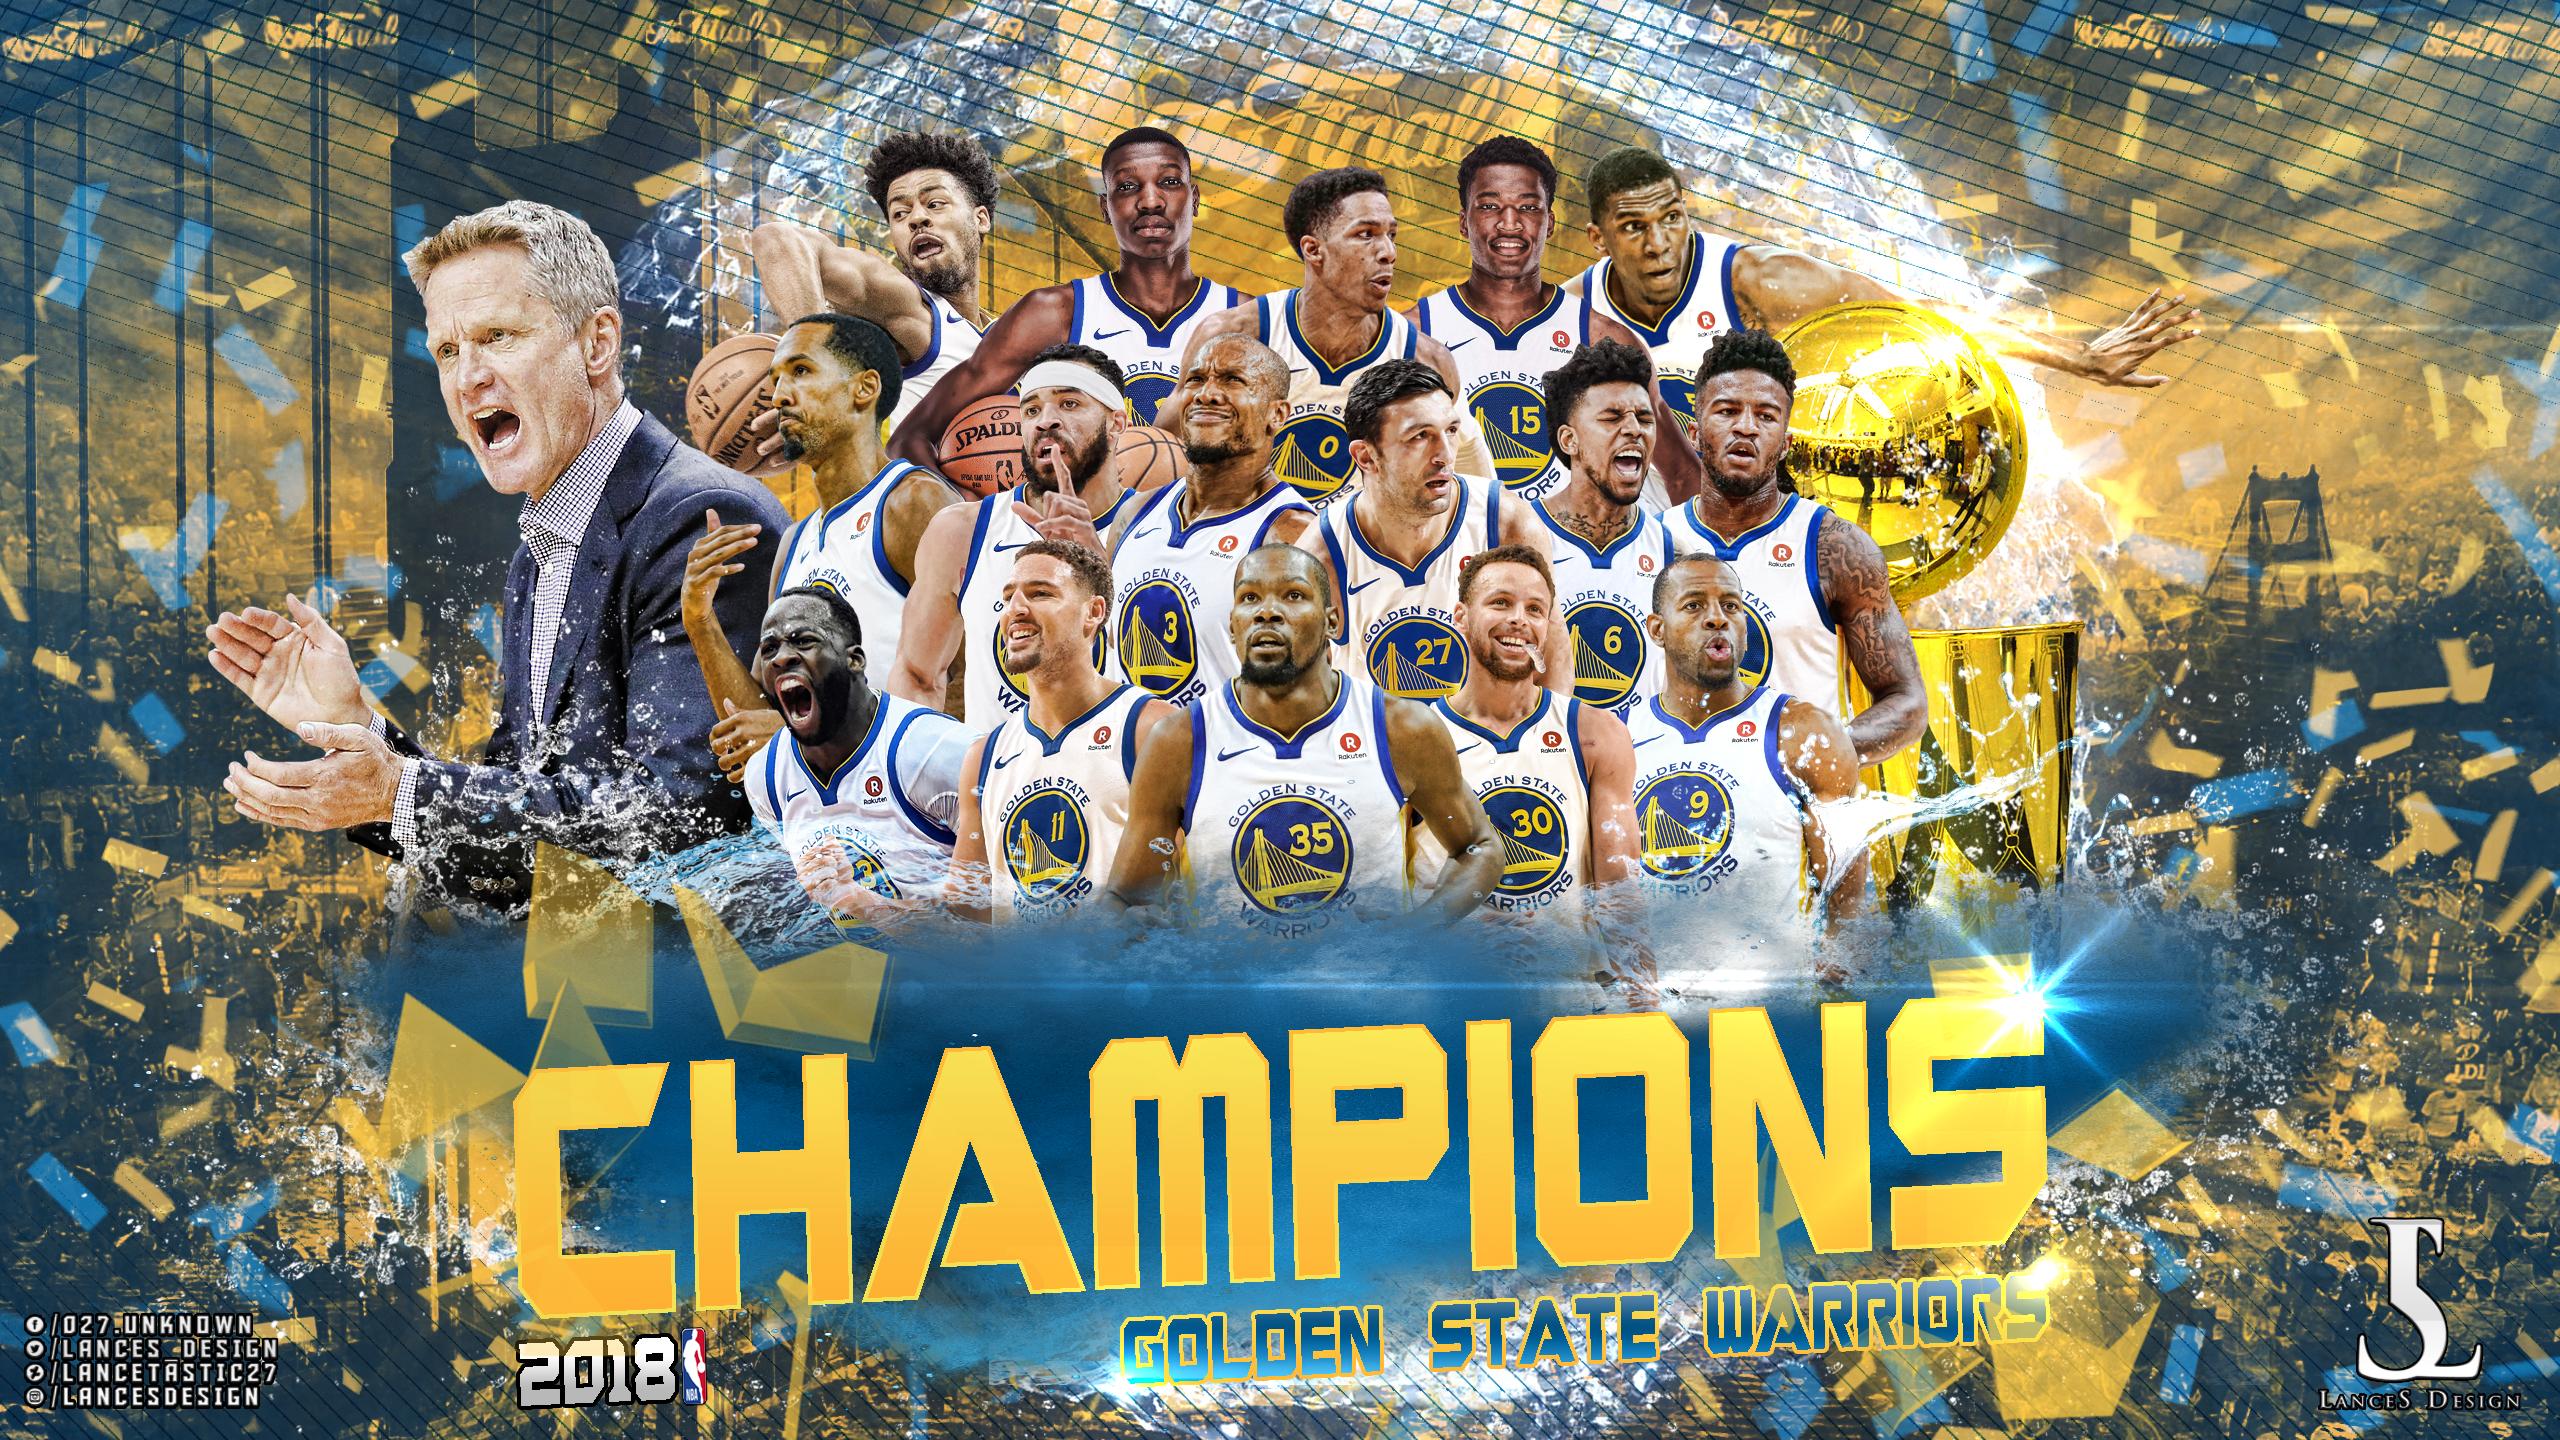 2018 Nba Champion Golden State Warriors Wallpaper By Lancetastic27 On Deviantart